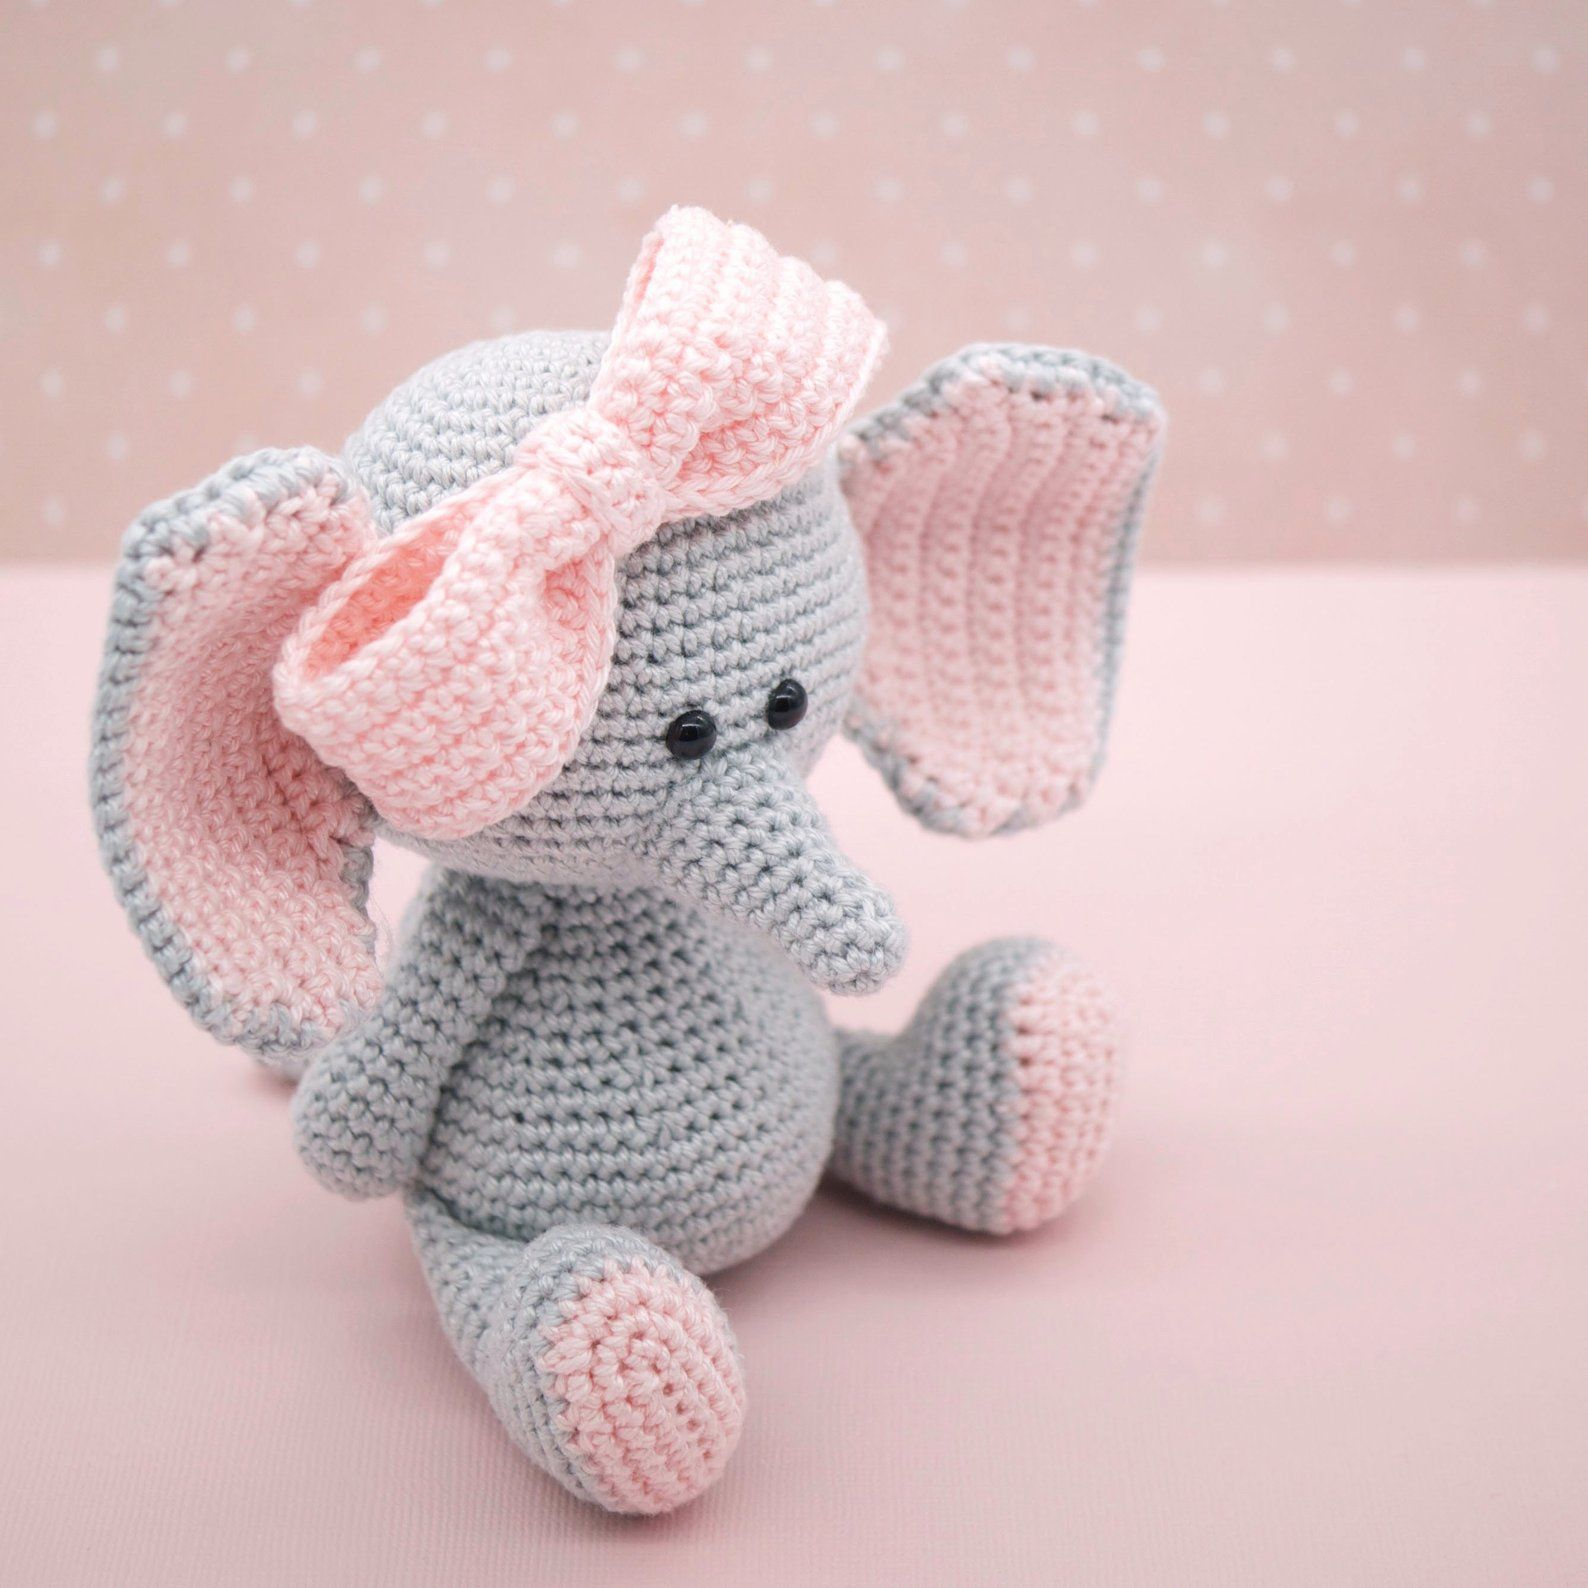 039 Crochet Elephant Amigurumi Instant Download English Pattern CROCHET PATTERN Character Coin Purse Crochet Pattern 15 cm